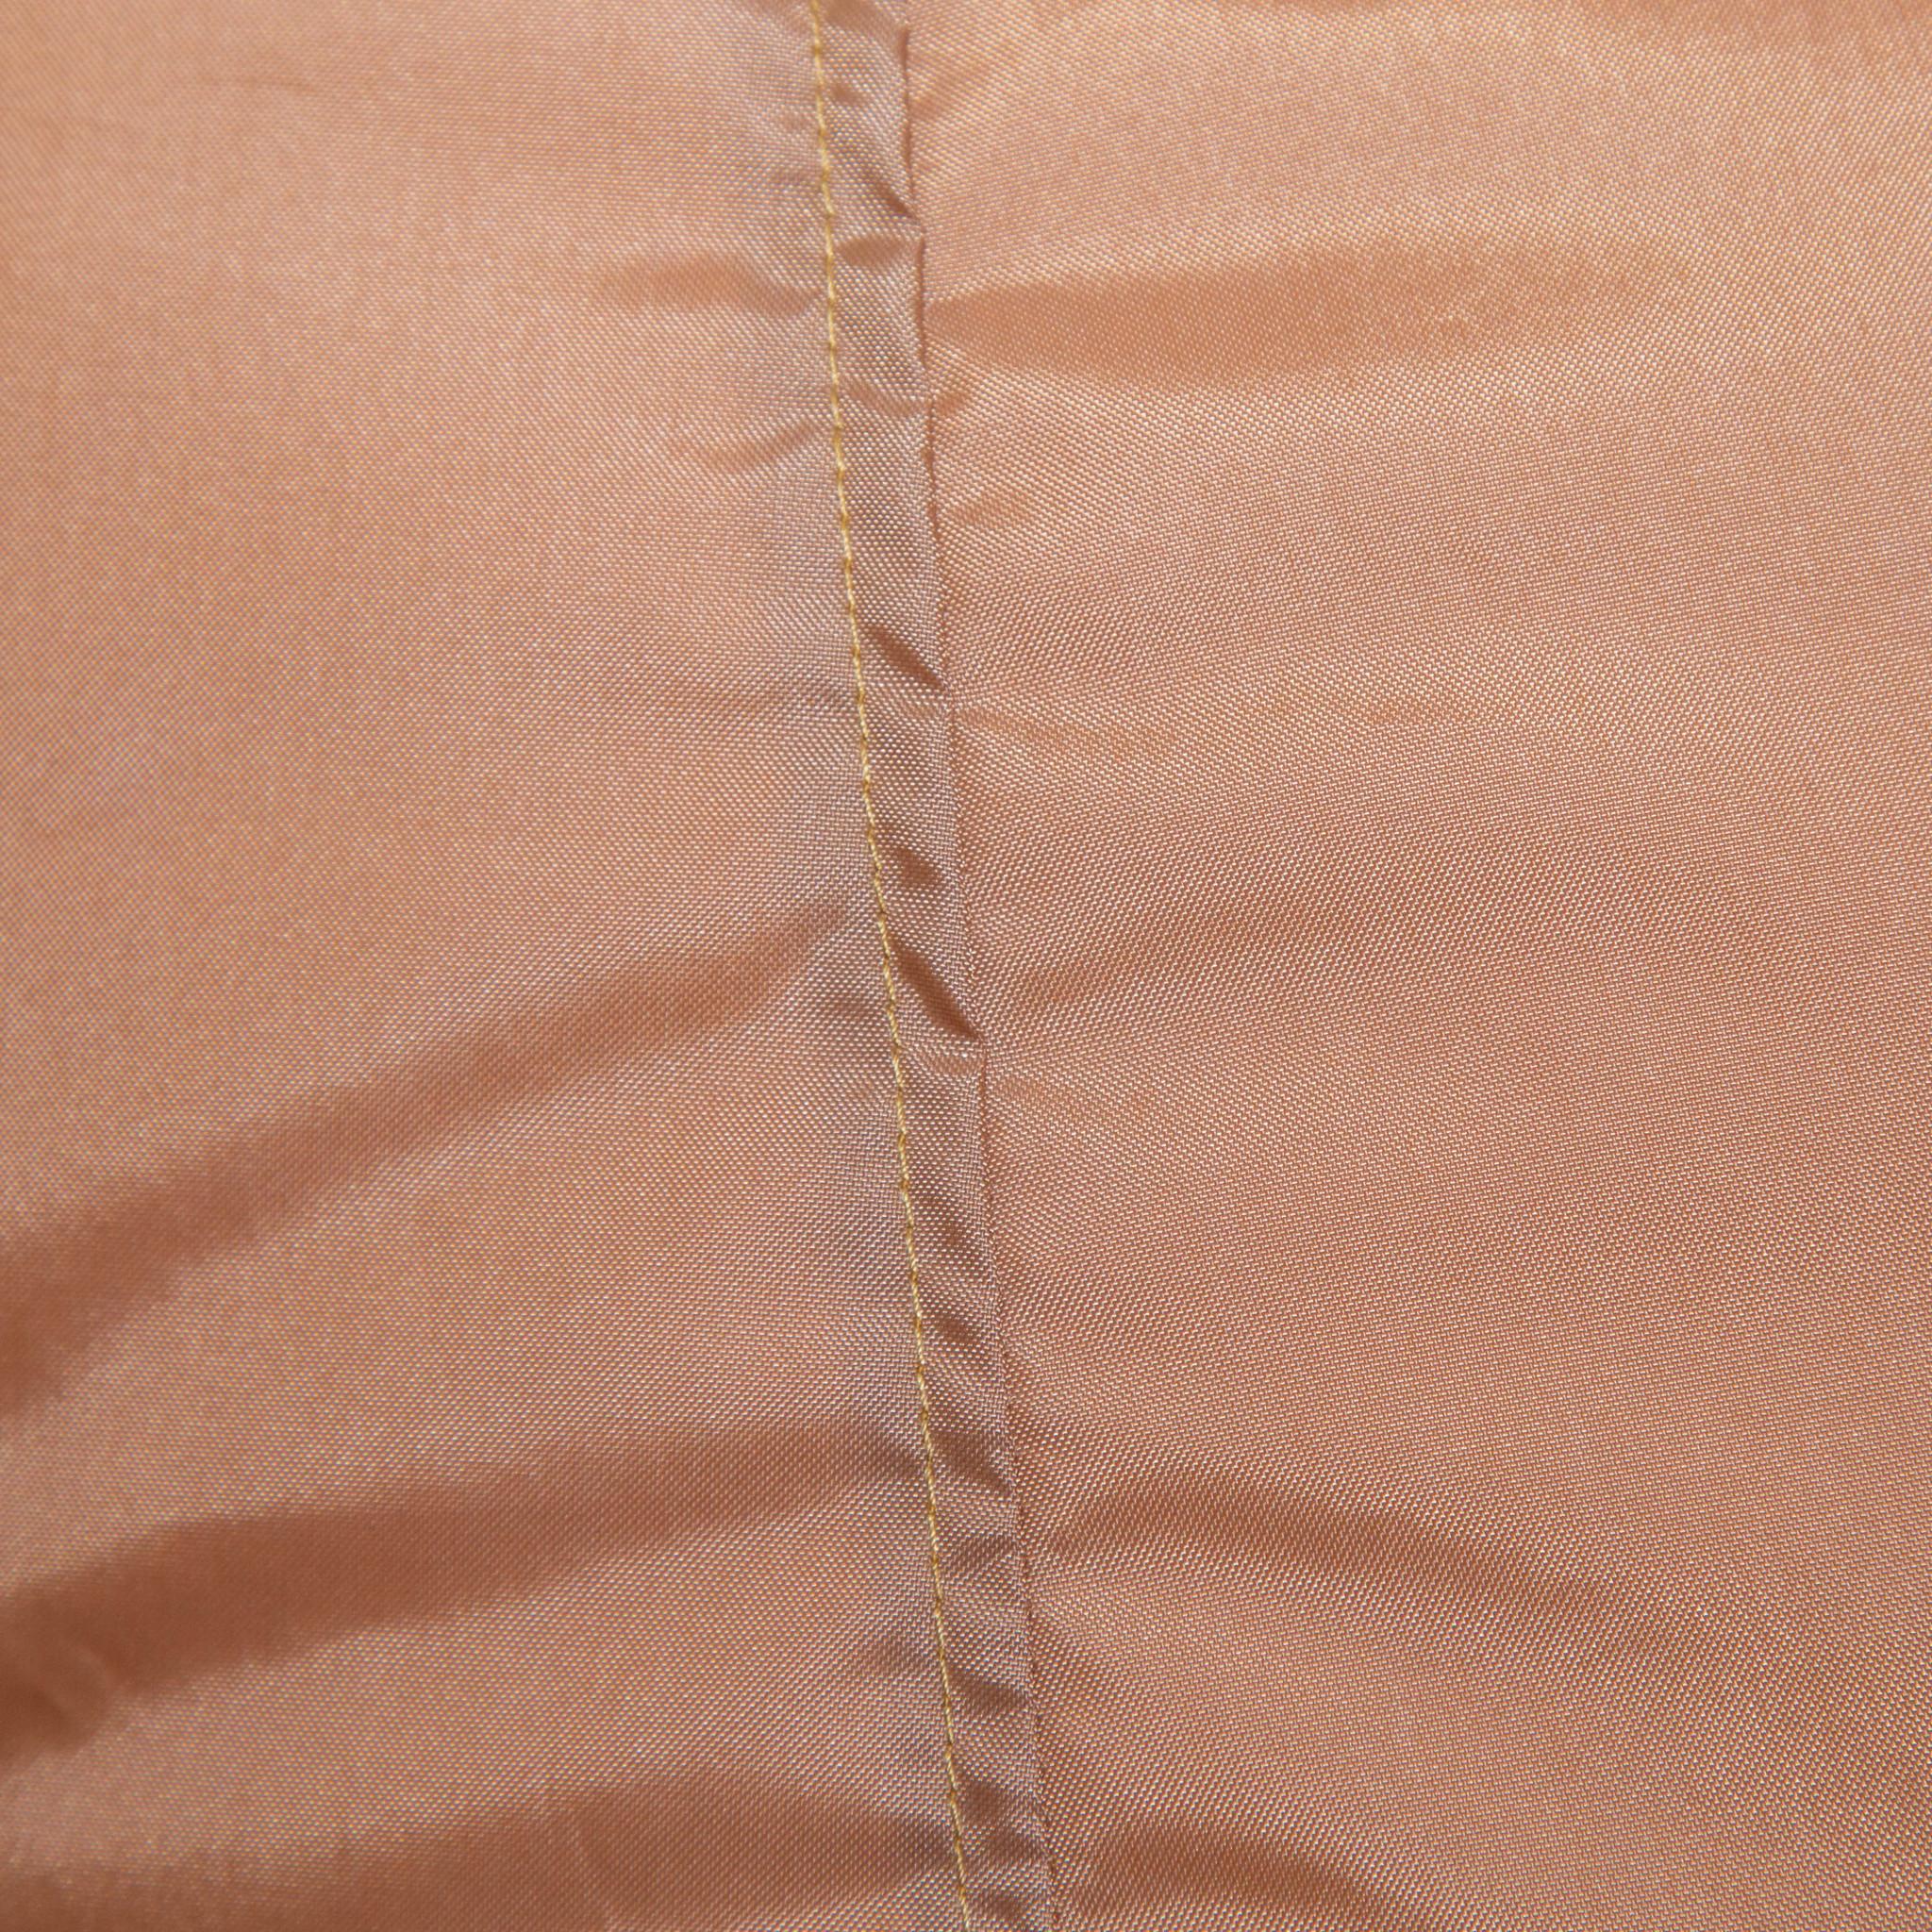 Груша М плащёвка, съёмный чехол (карамель)